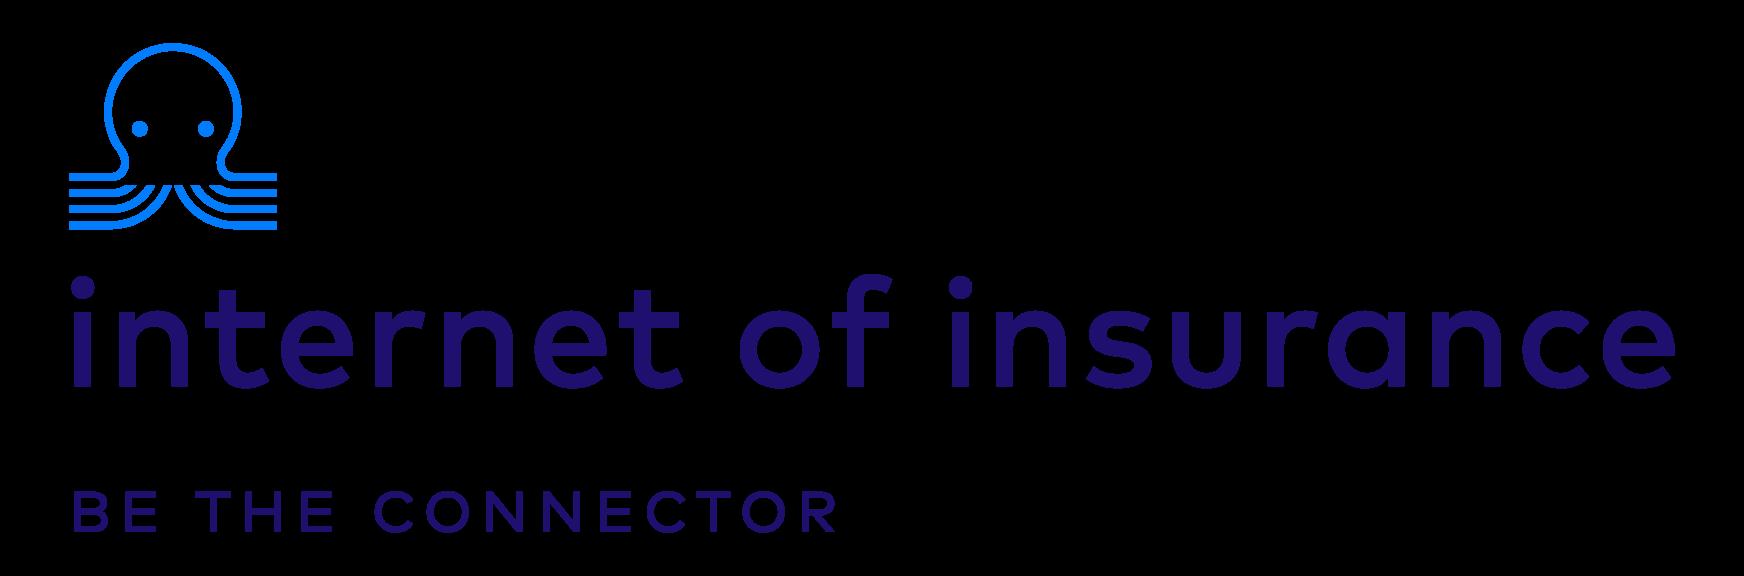 Internet of Insurance